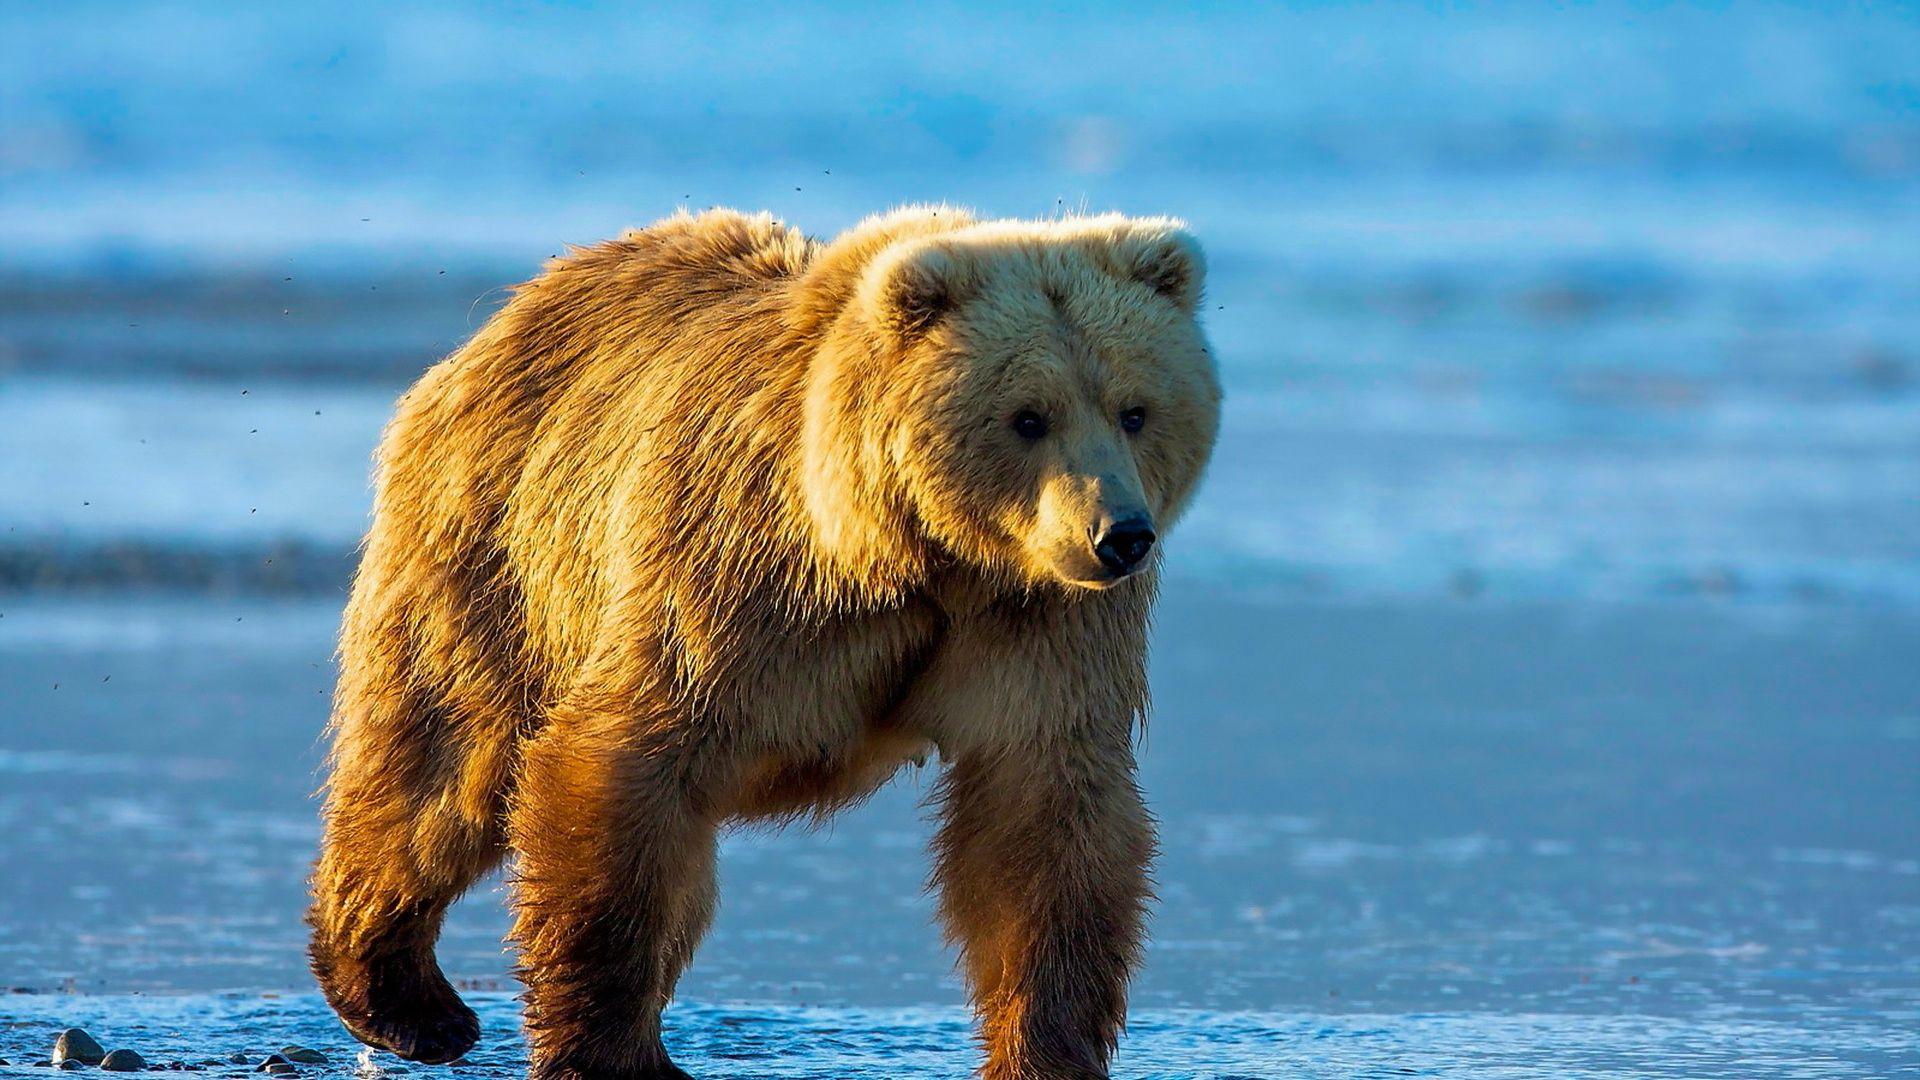 Wallpaper Bear, wild animal, furry animal